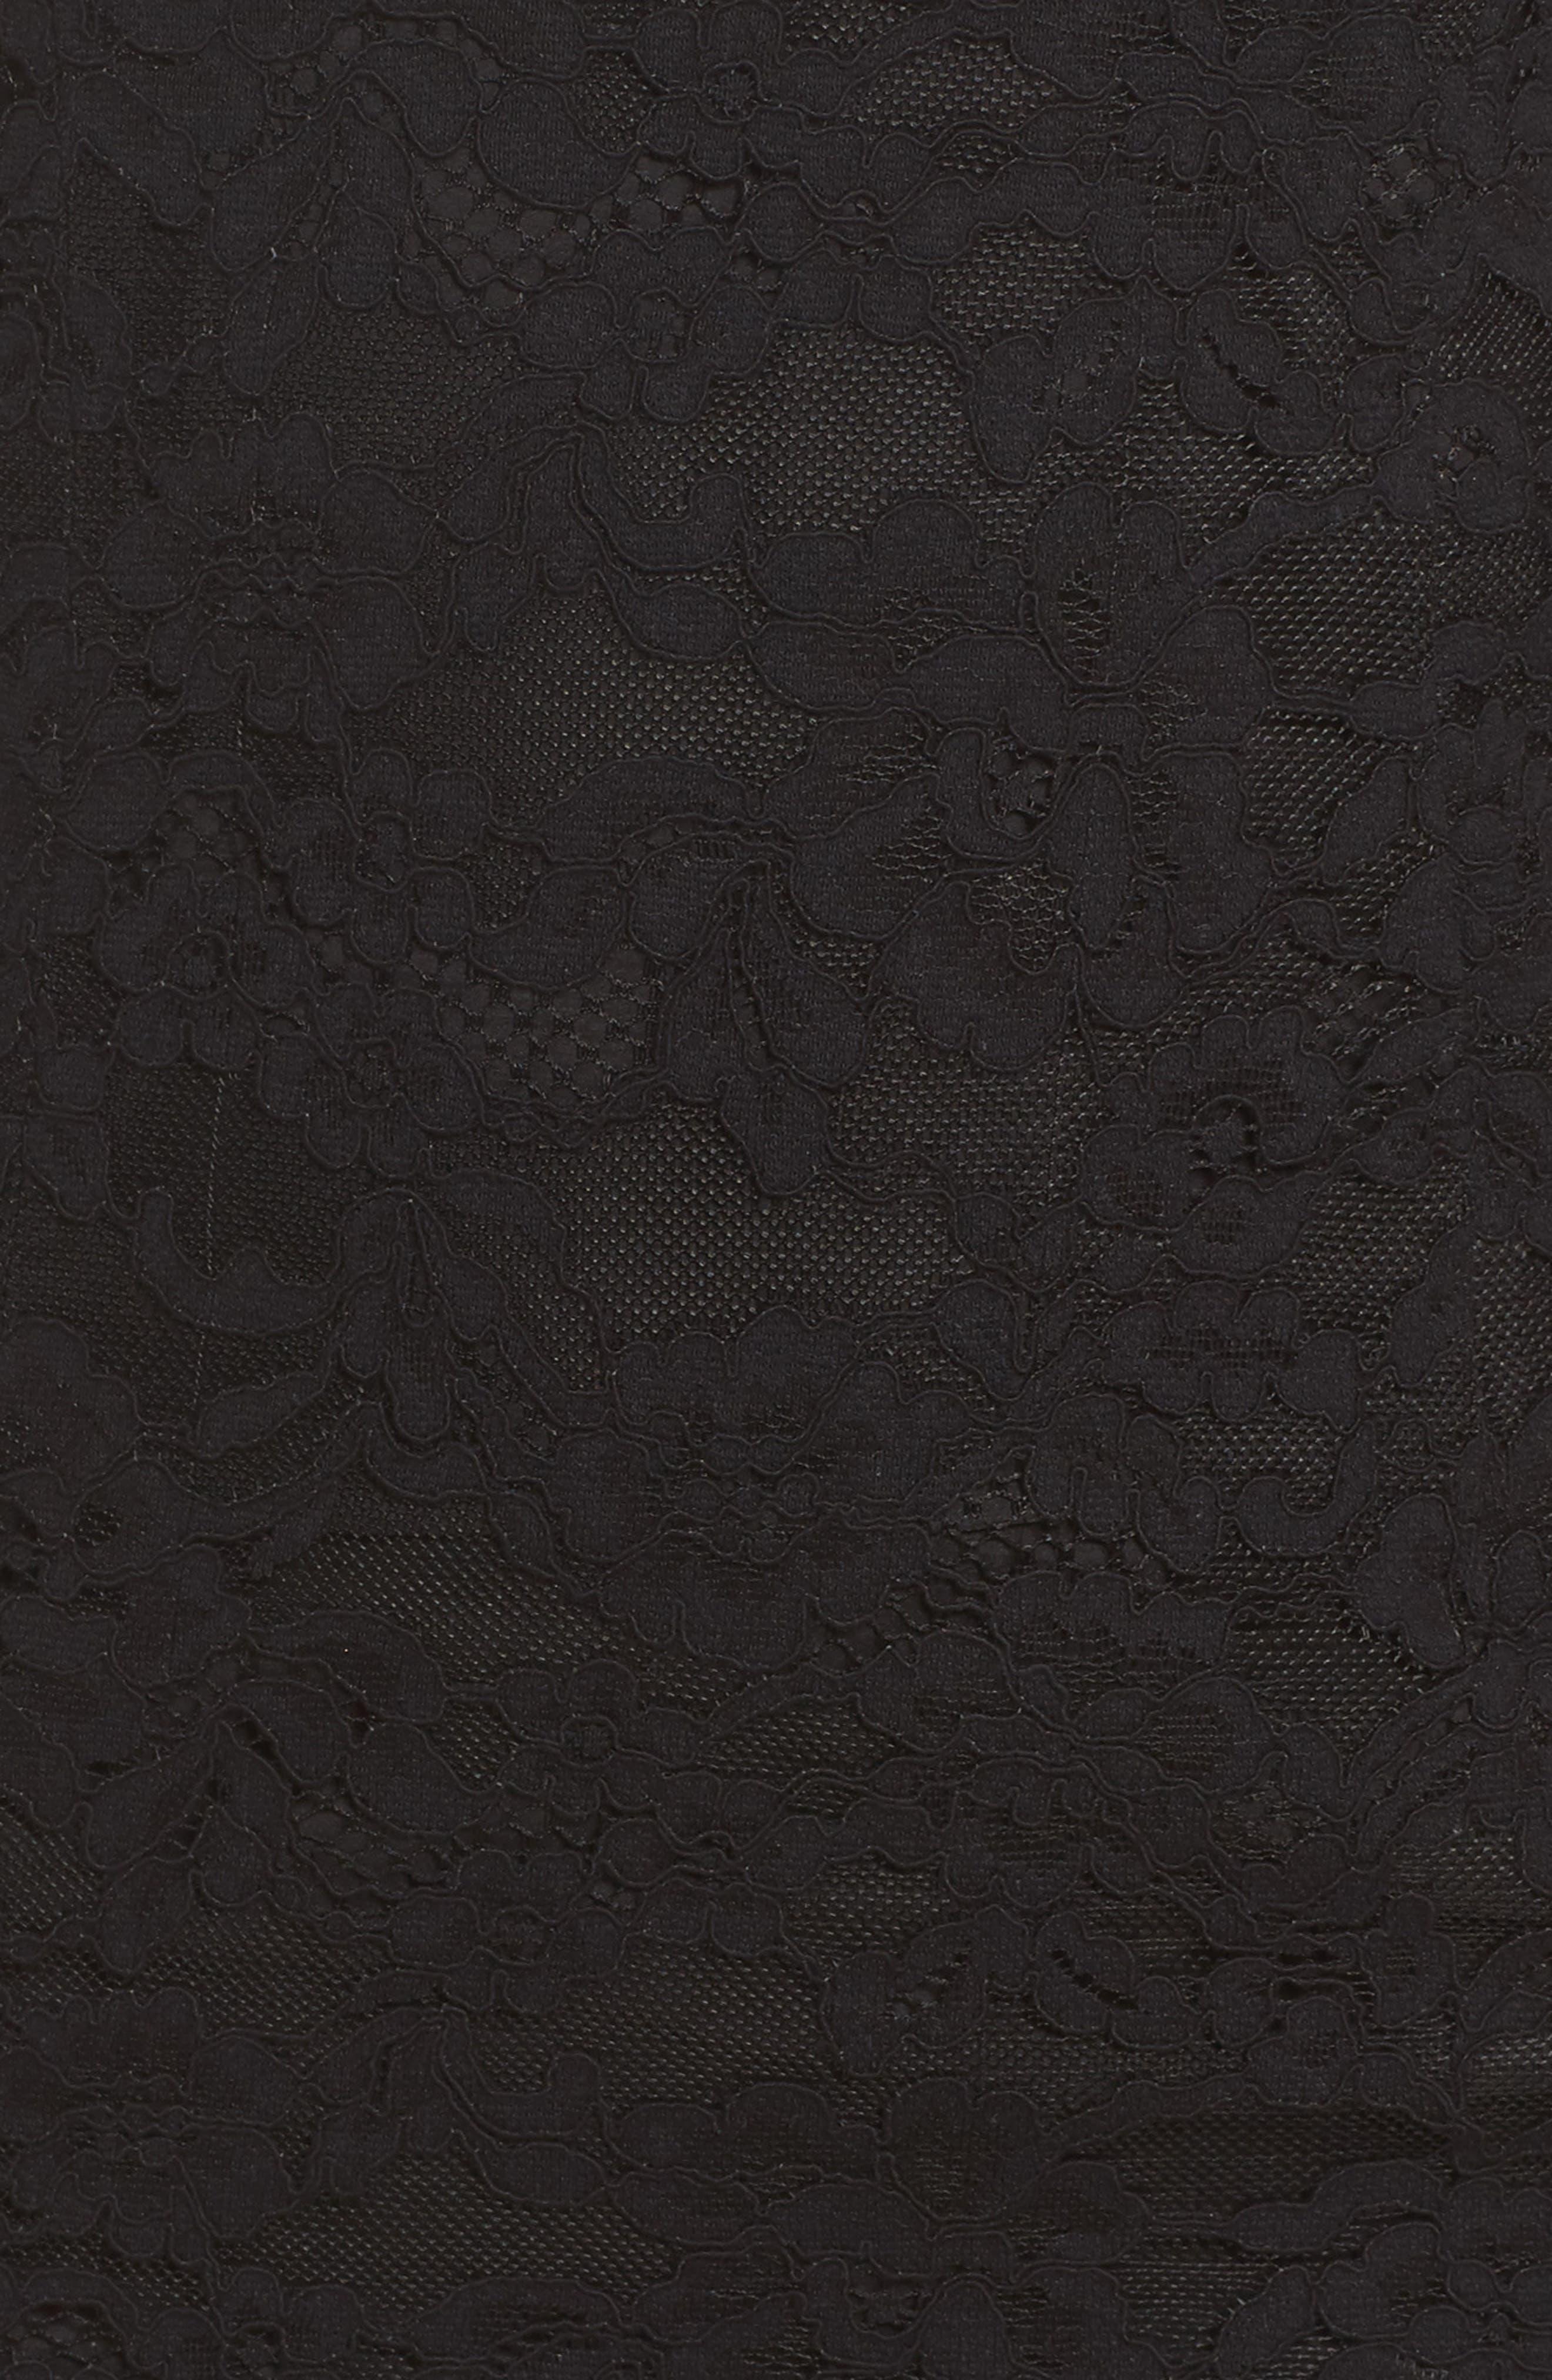 Fiorella One-Shoulder Lace Body-Con Dress,                             Alternate thumbnail 5, color,                             Black